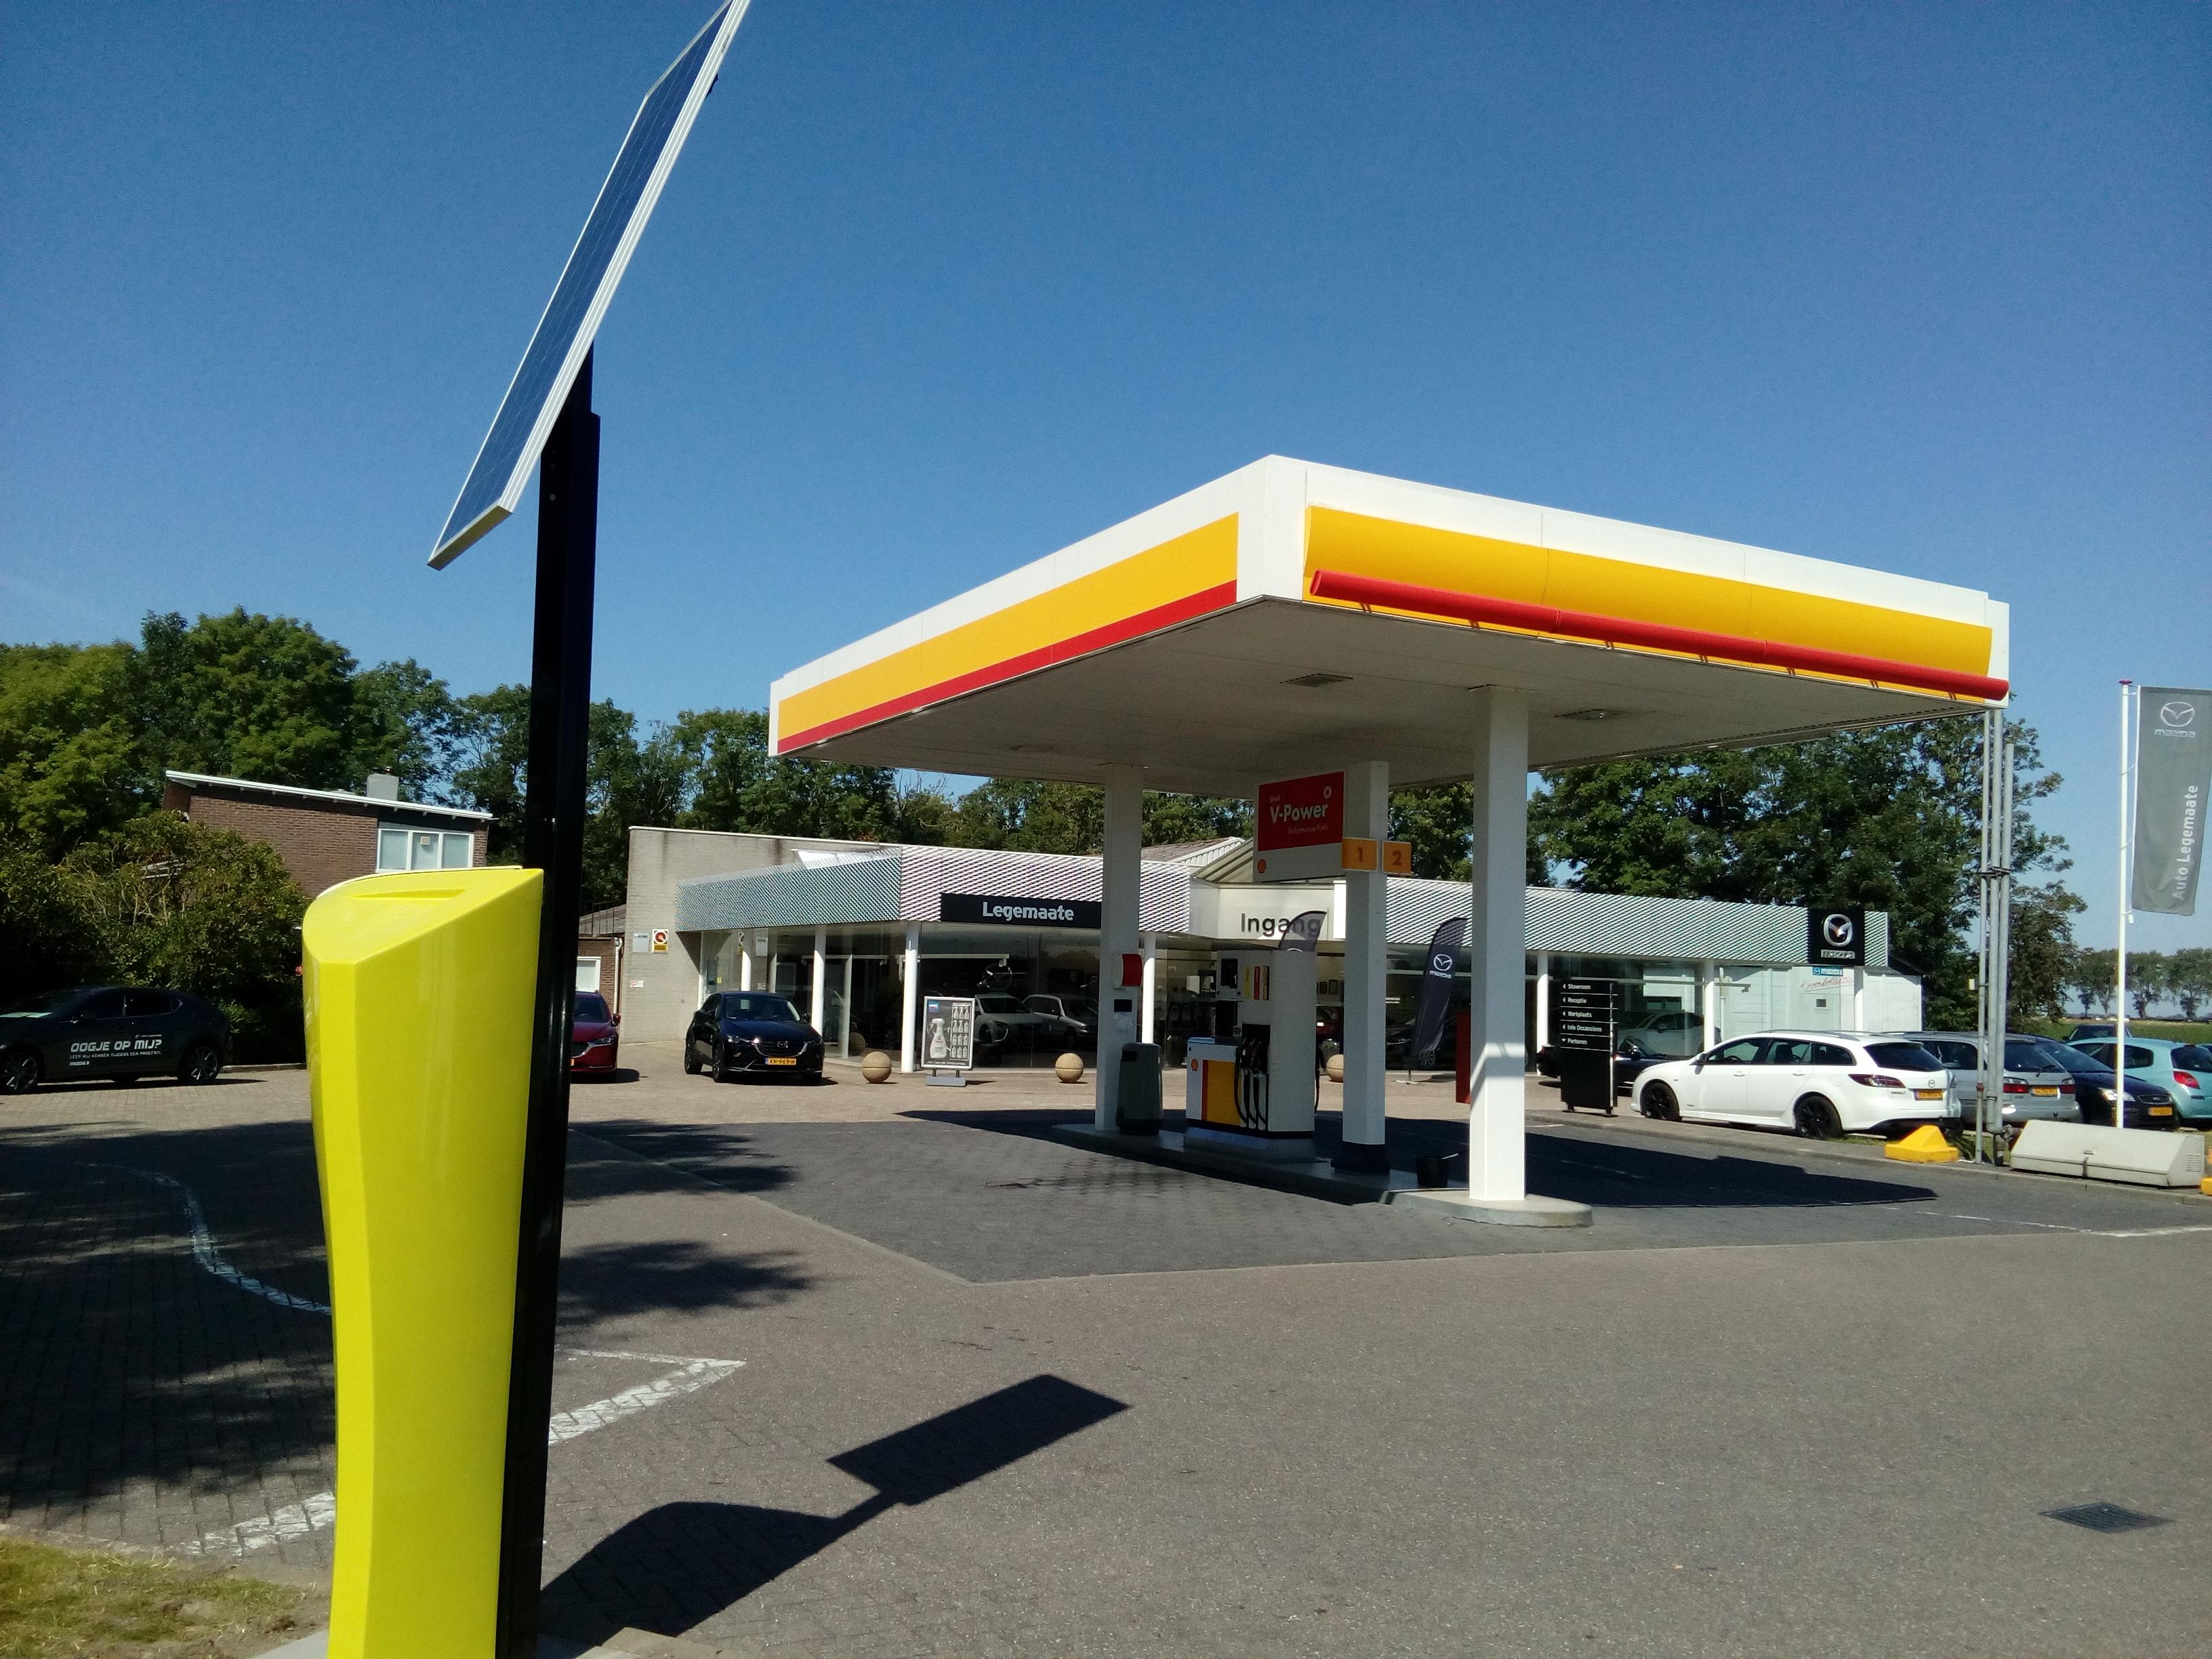 Shell Legemaate, Zierikzee